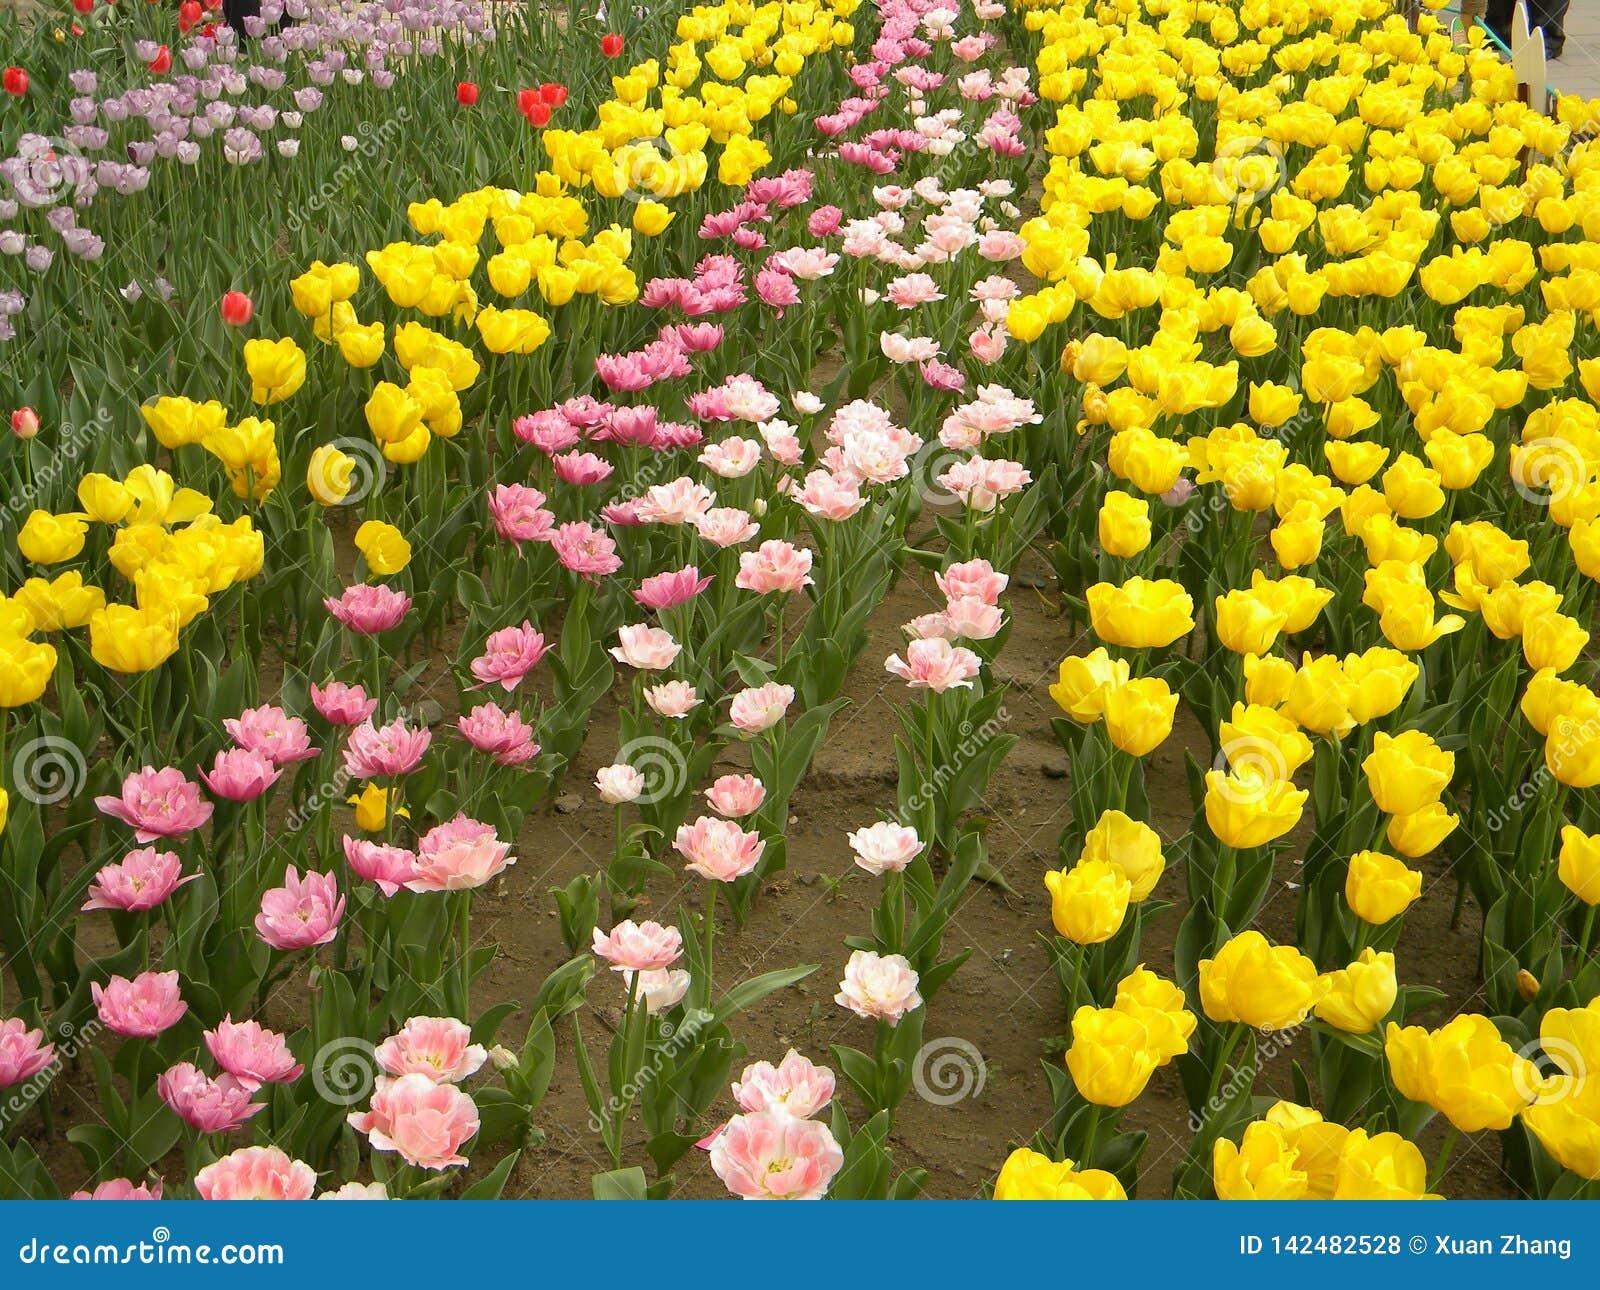 A large color turmeric flower